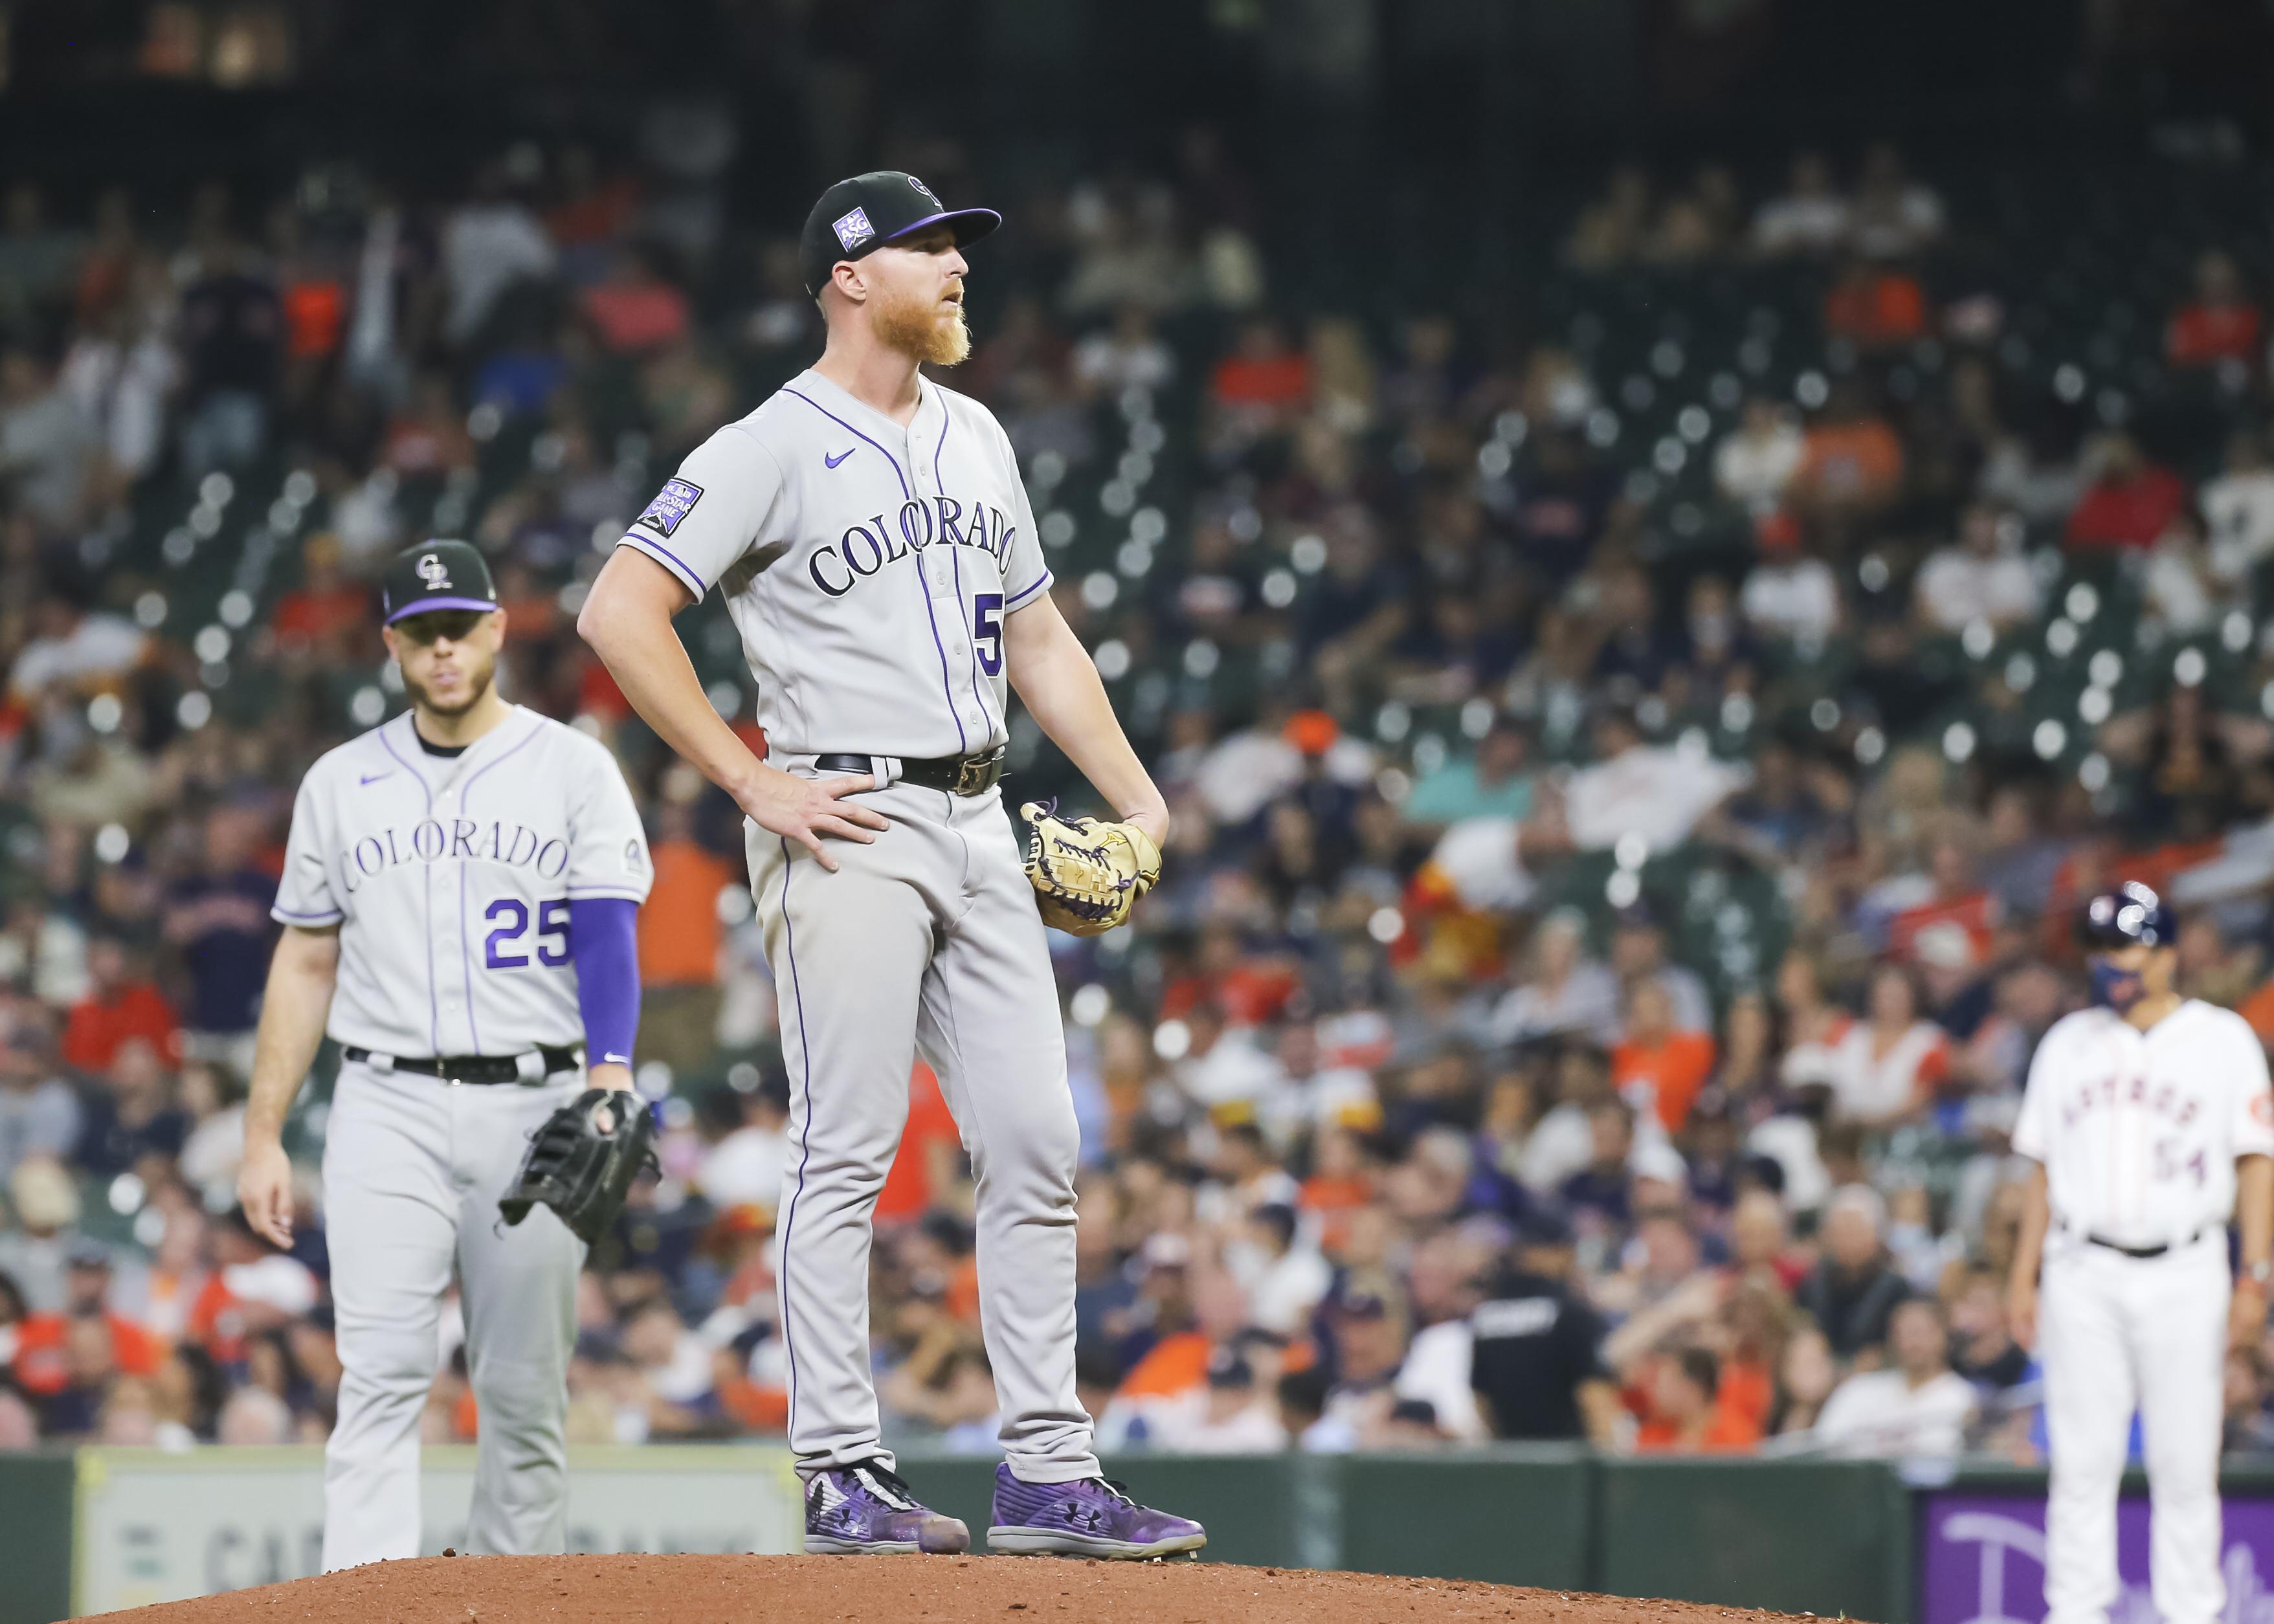 MLB: AUG 10 Rockies at Astros